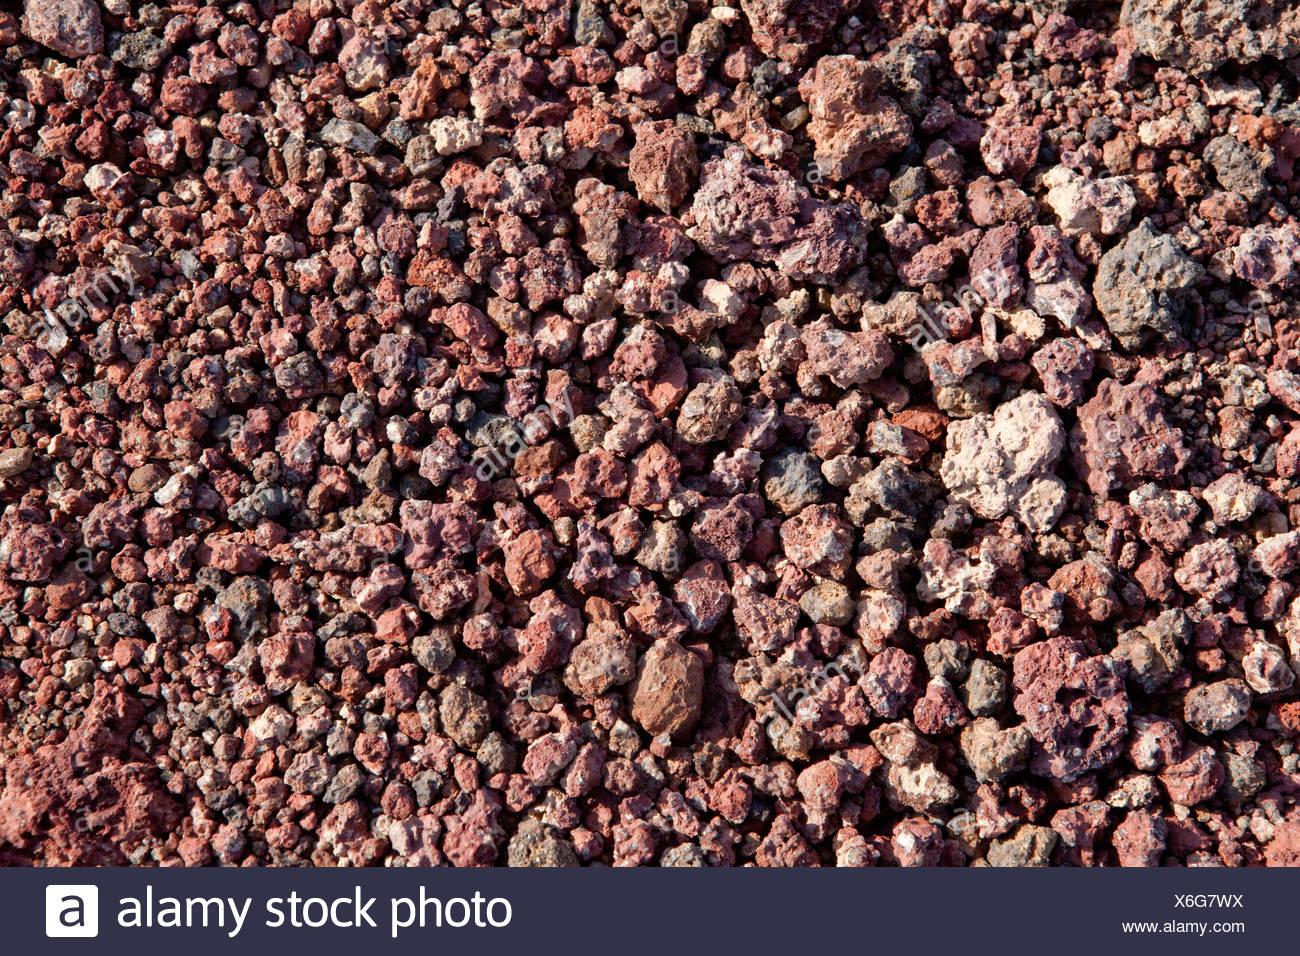 volcanical, rock, Ardoukoba, Assal, Africa, structure, Djibouti, - Stock Image